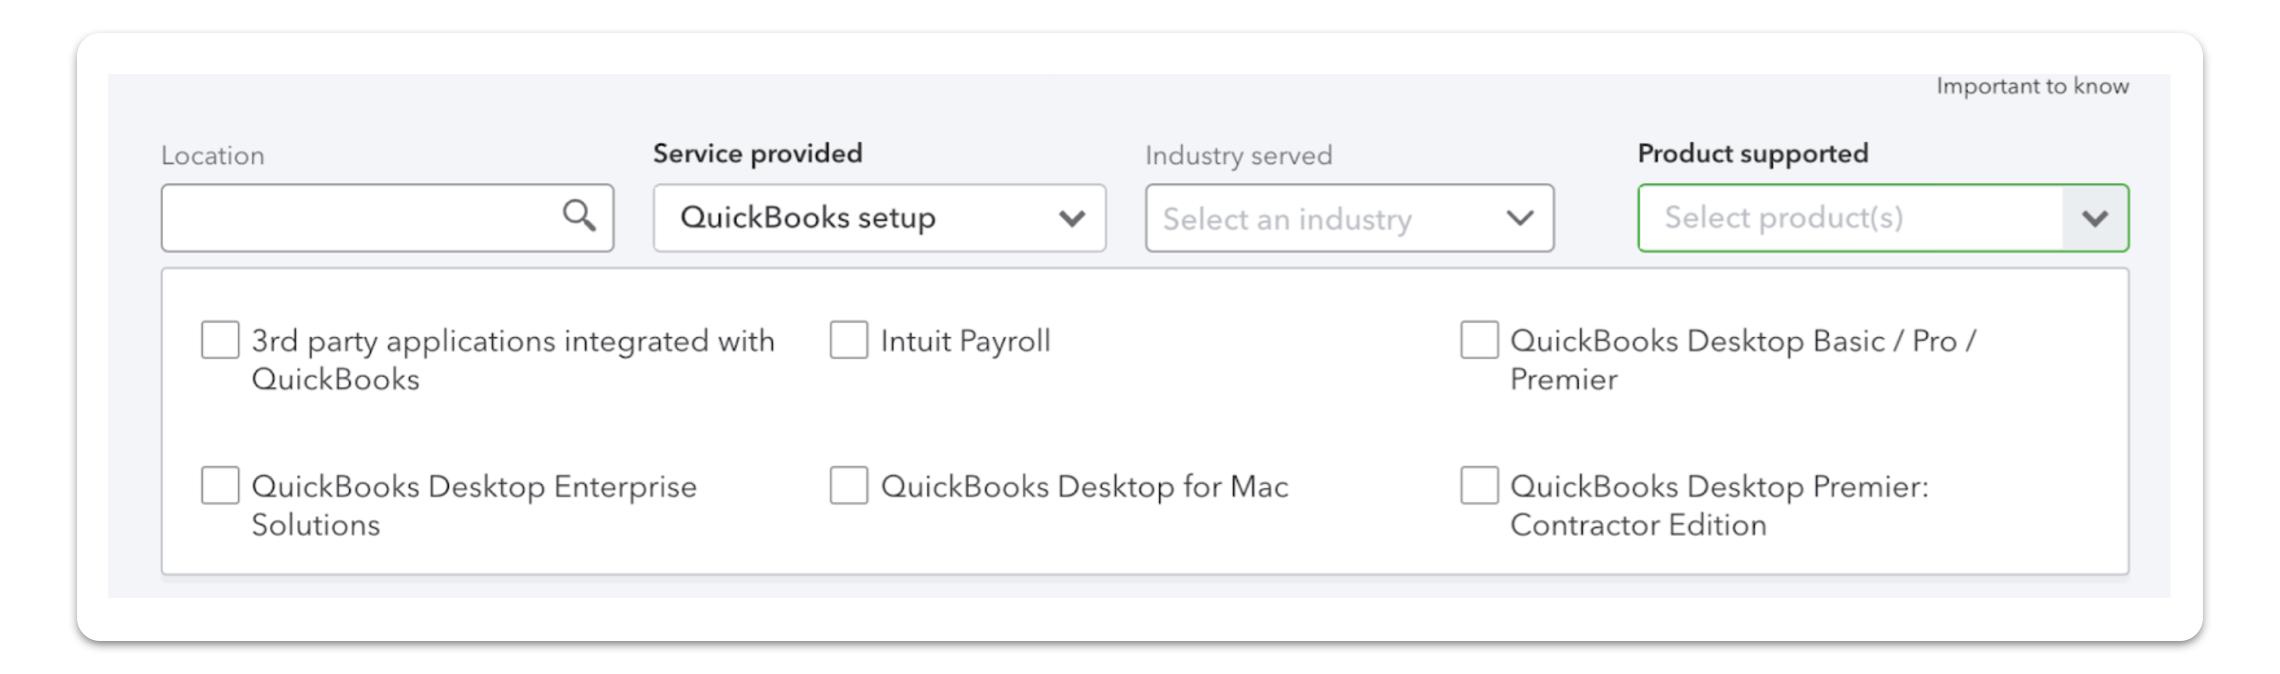 QuickBooks ProAdvisor search tool screenshot